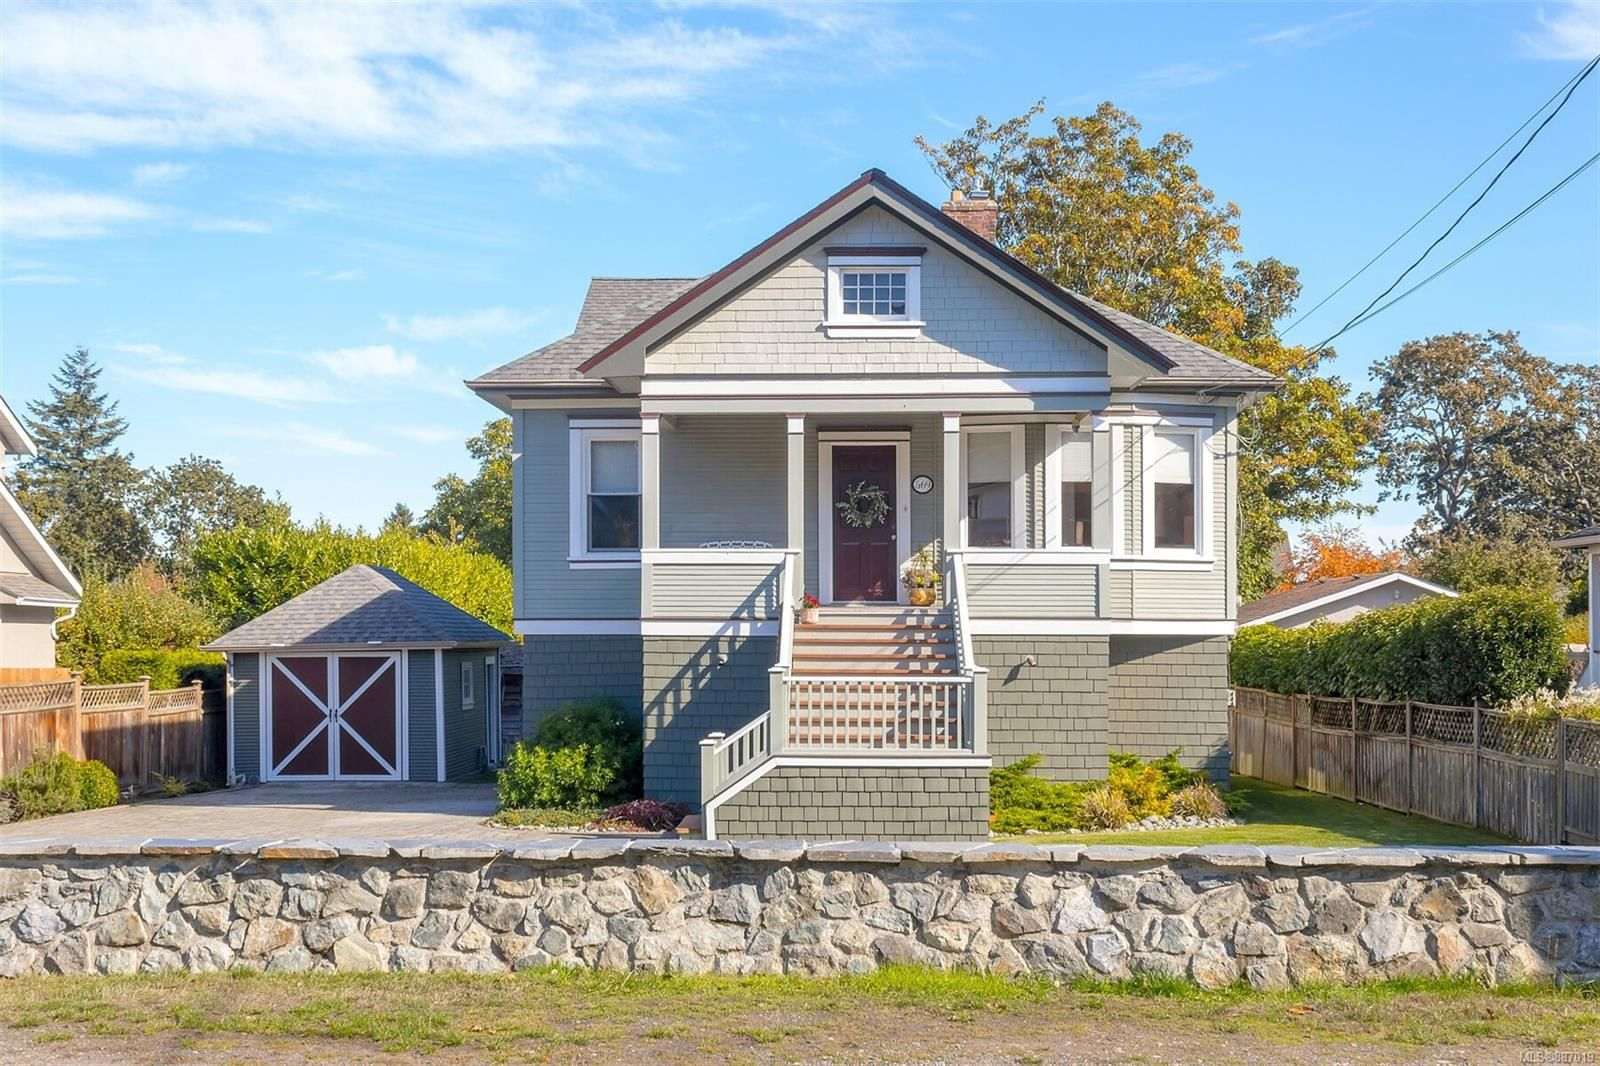 Main Photo: 569 Falkland Rd in : OB South Oak Bay House for sale (Oak Bay)  : MLS®# 887019